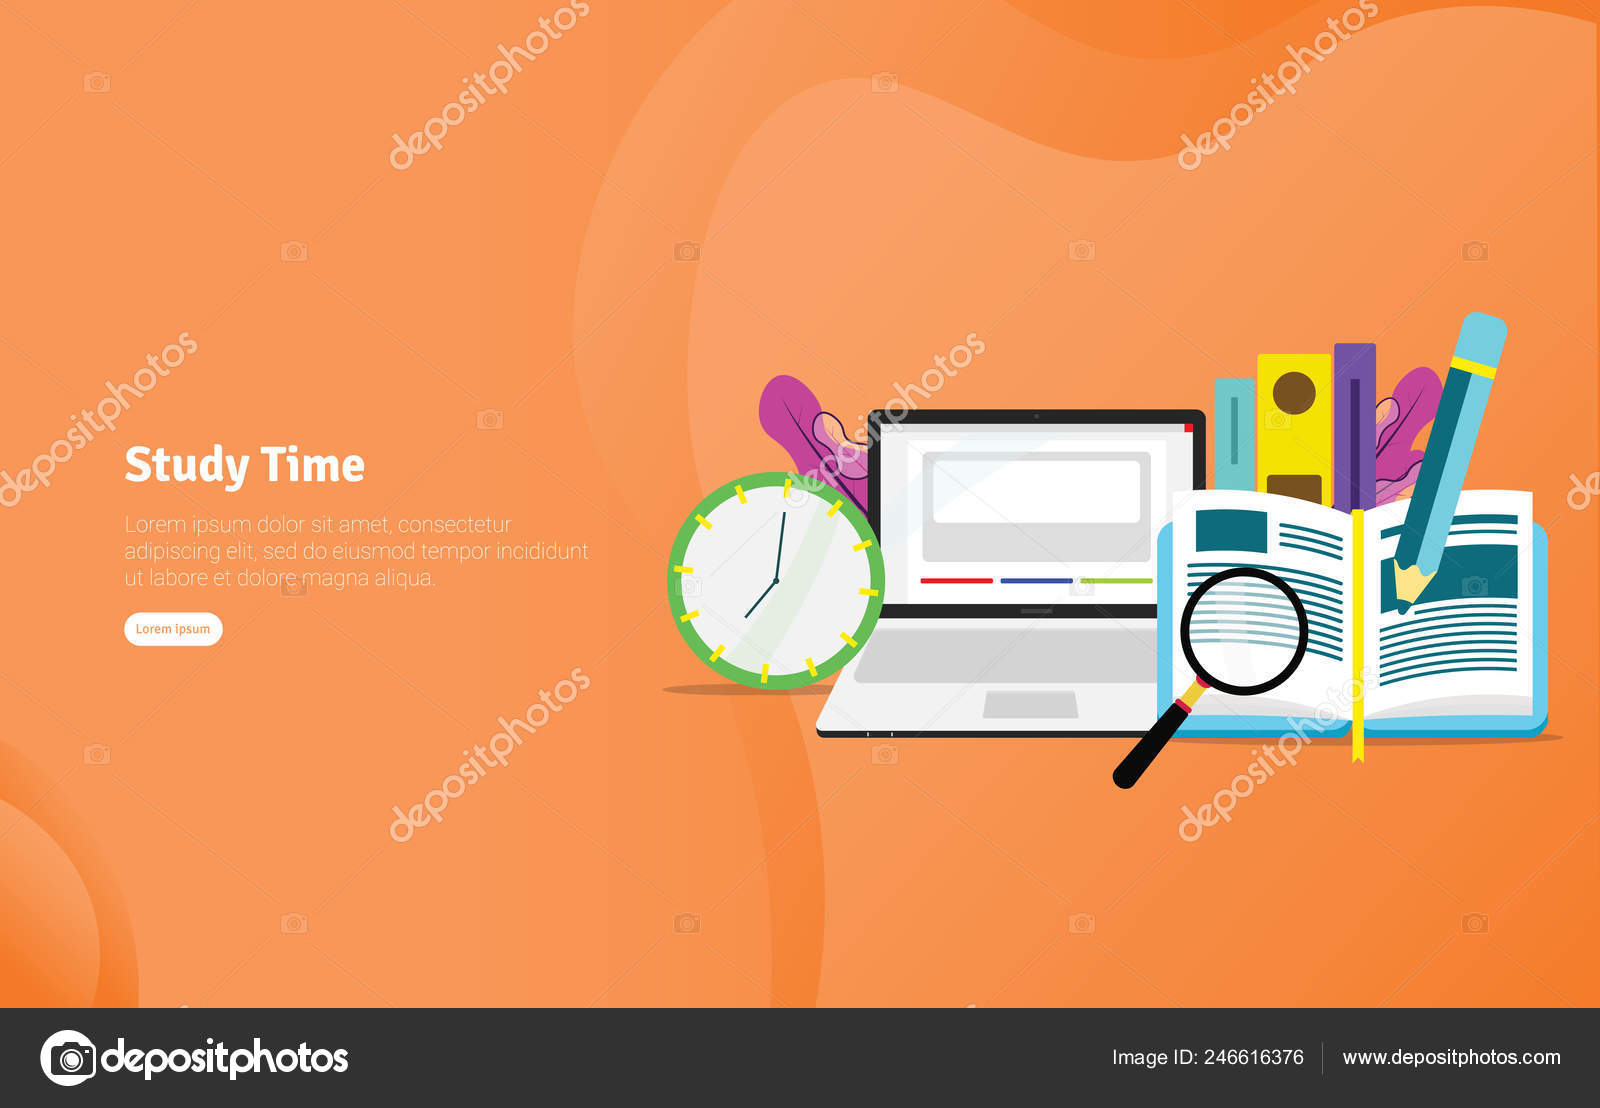 Study Time Students Concept Educational Scientific Illustration Banner Suitable Wallpaper Stock Vector C Graphiqa 246616376